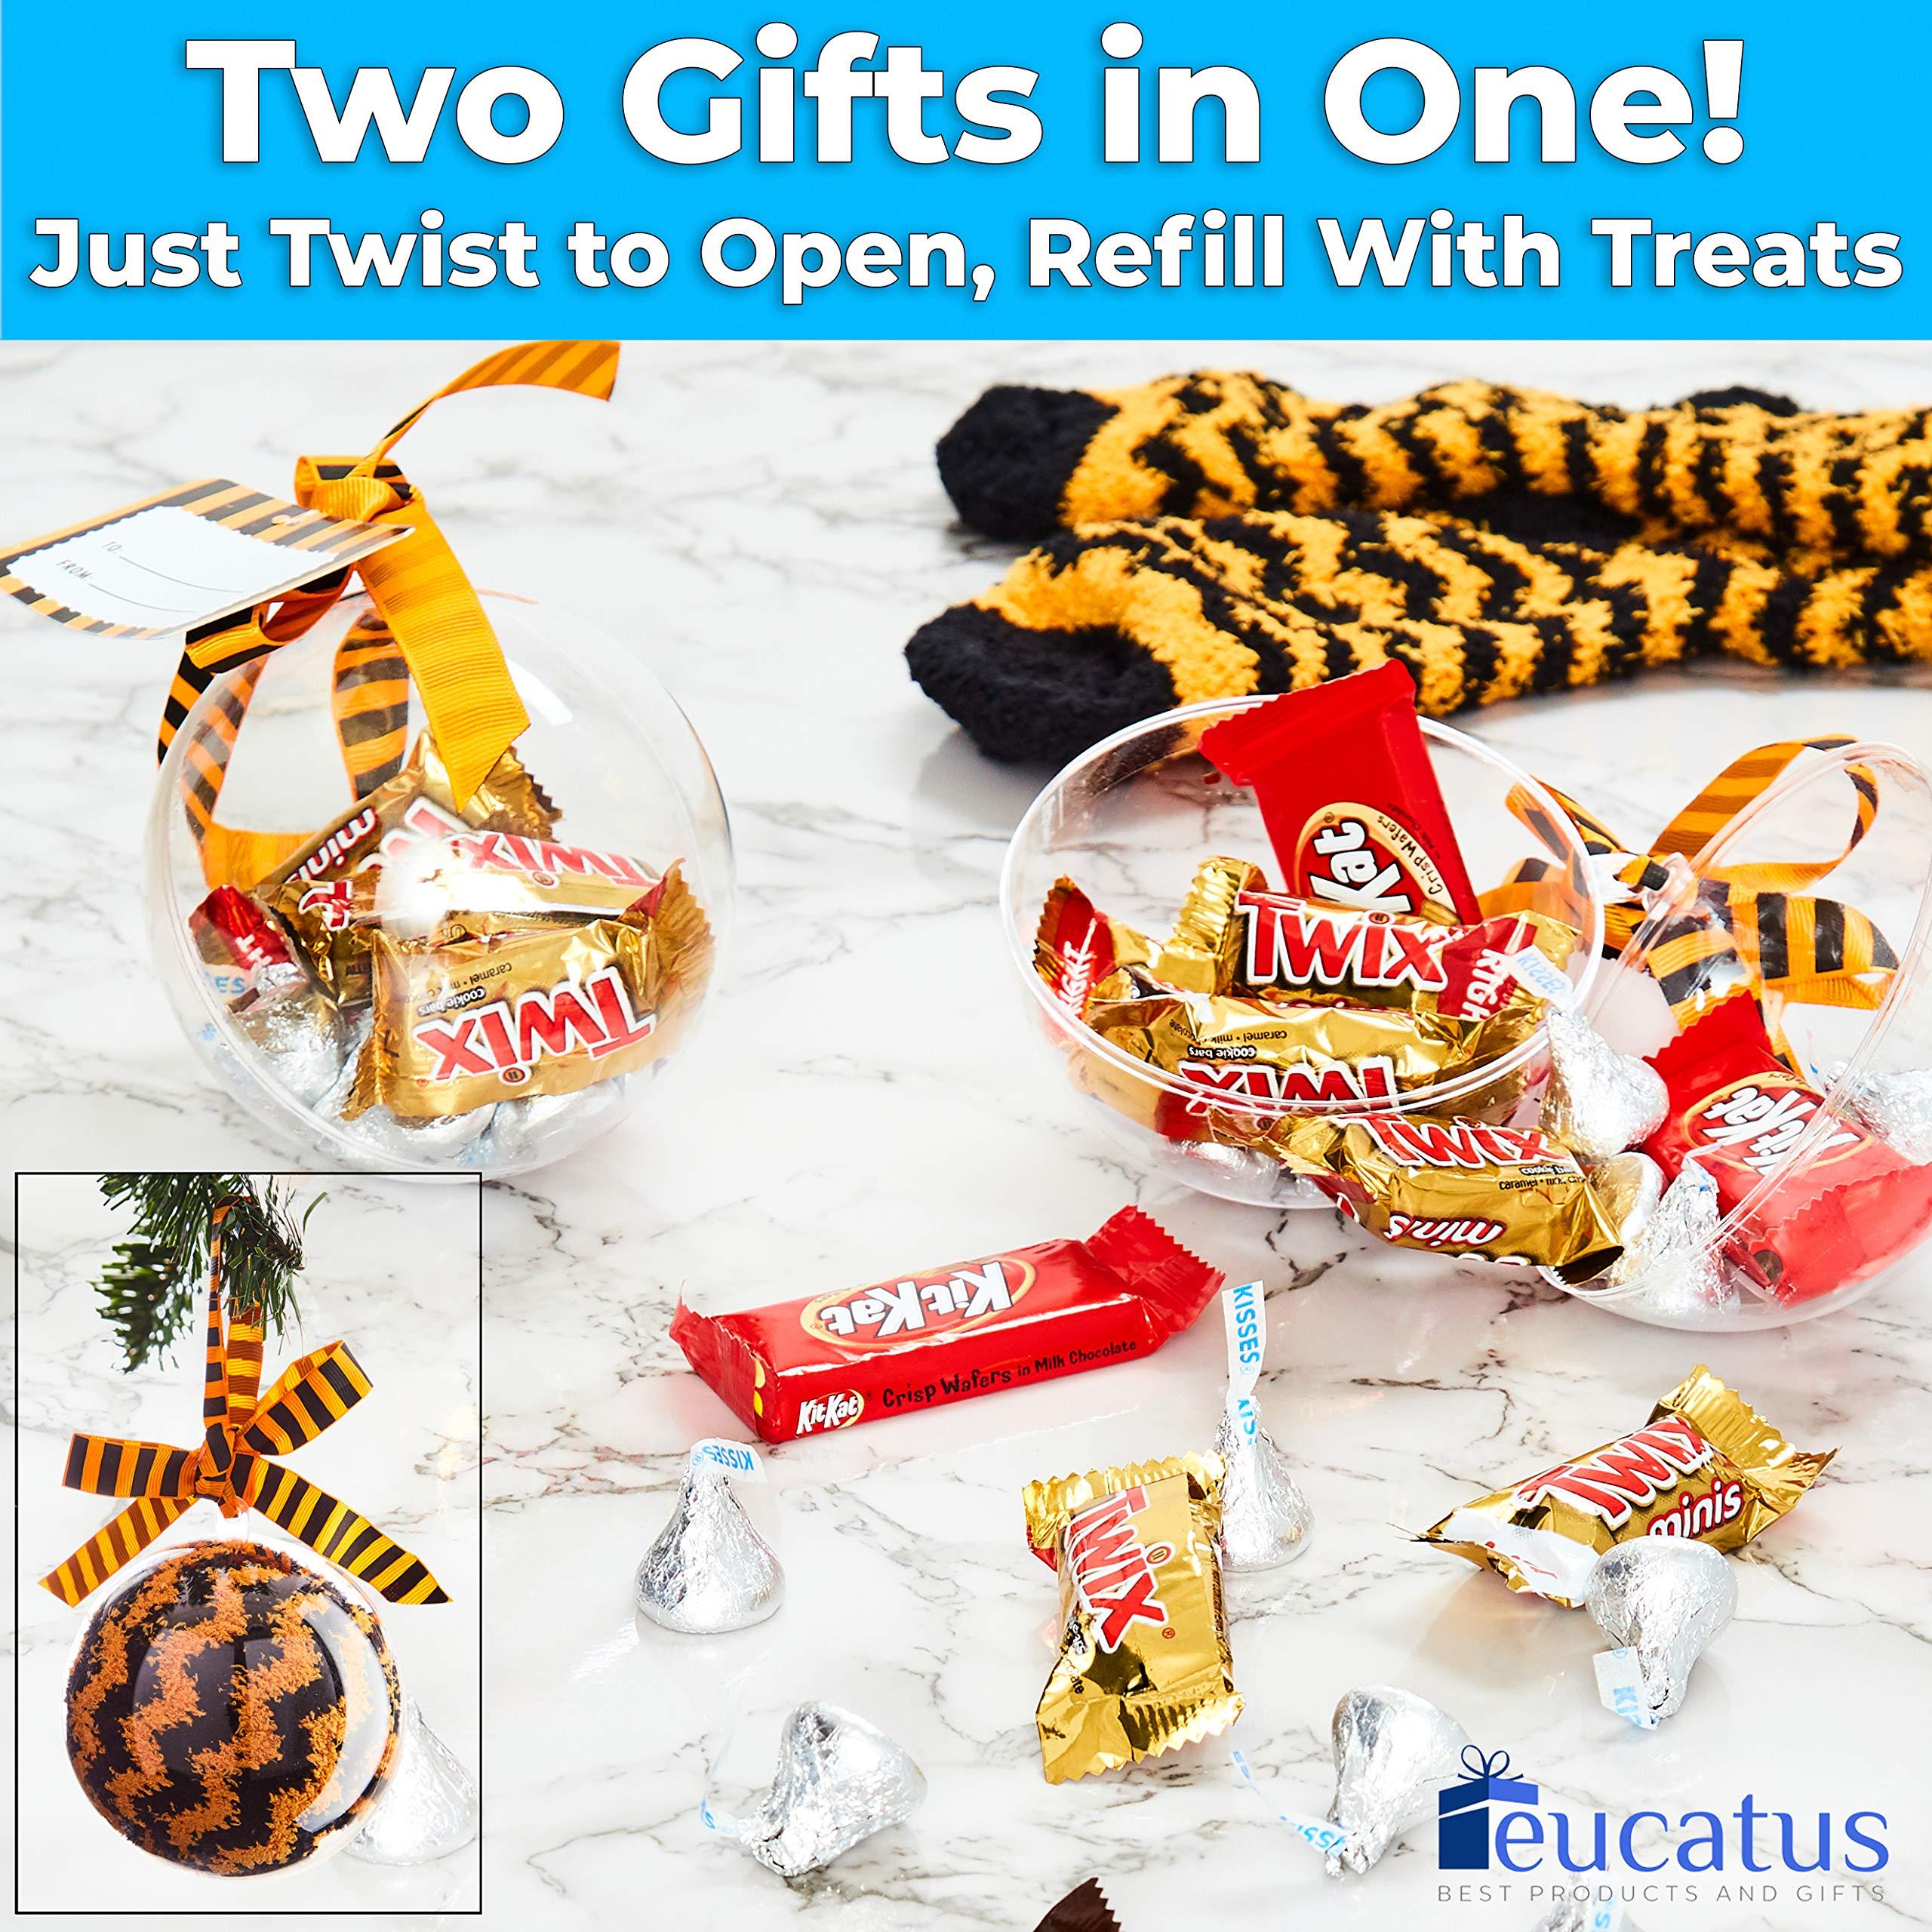 miniature 14 - Super Soft, Fuzzy Halloween Spa Socks in Gift Ornament, Womens Size 6-10